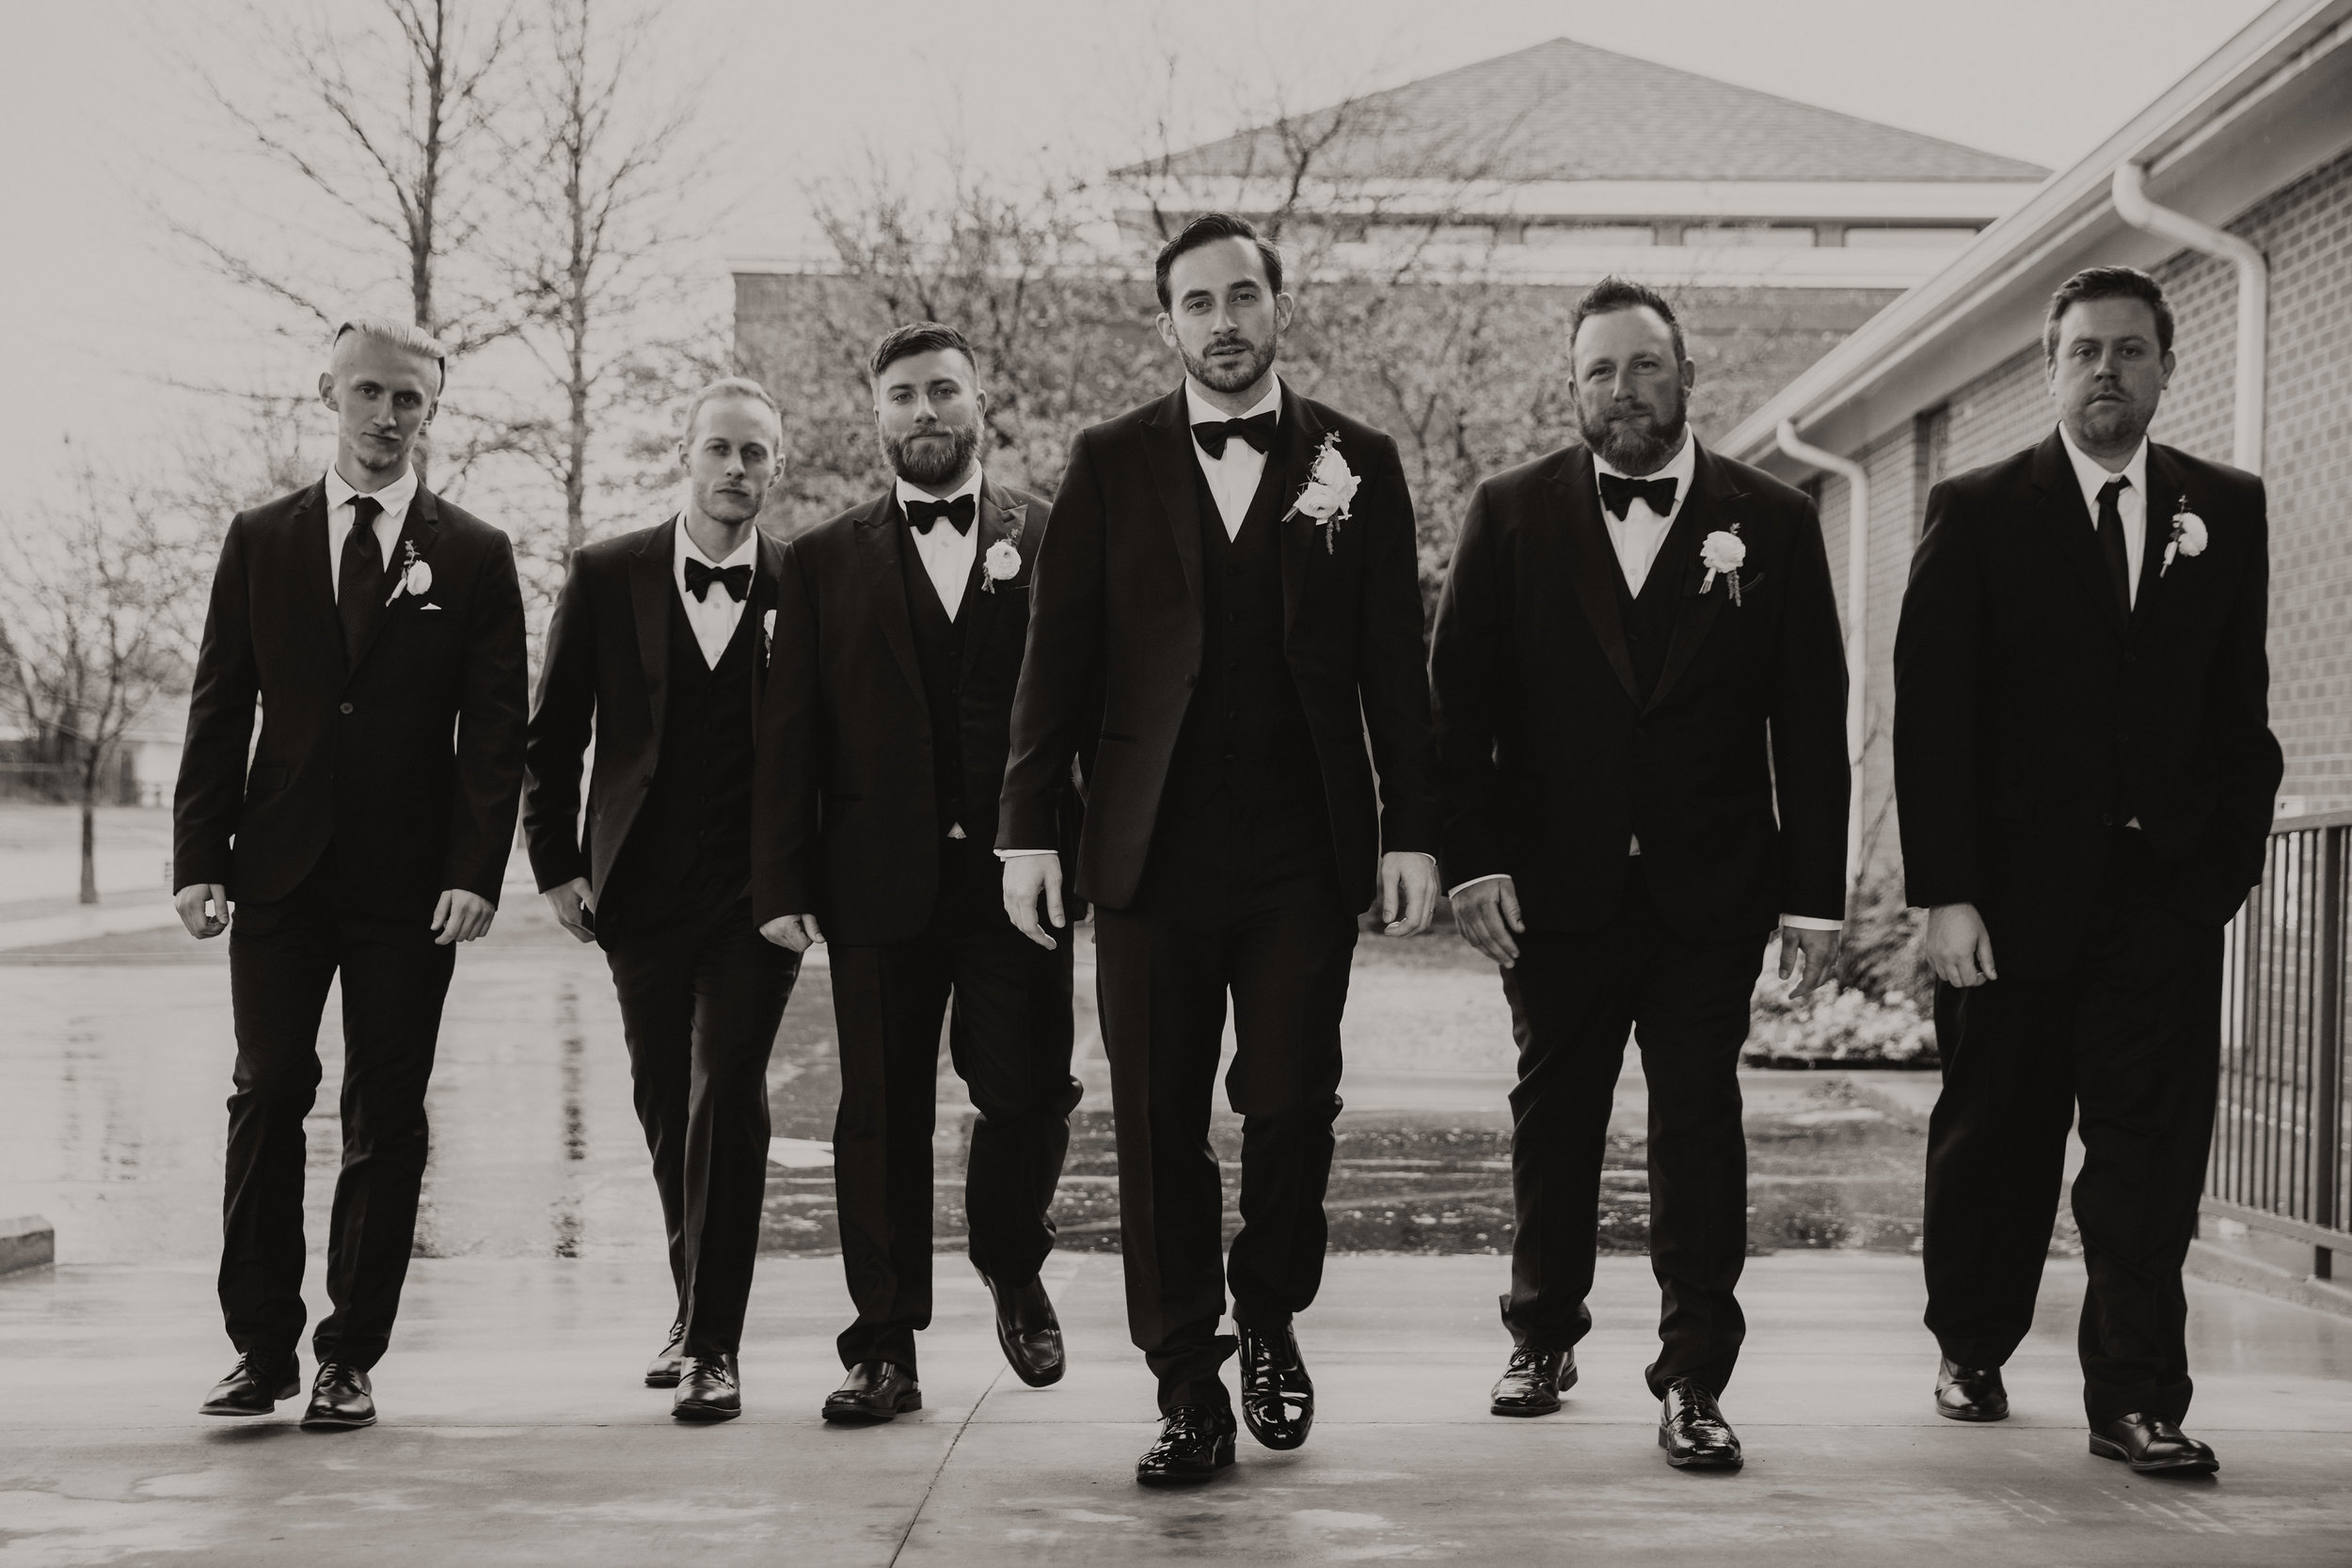 Patterson_Wedding_Bridal_Party_033.jpg